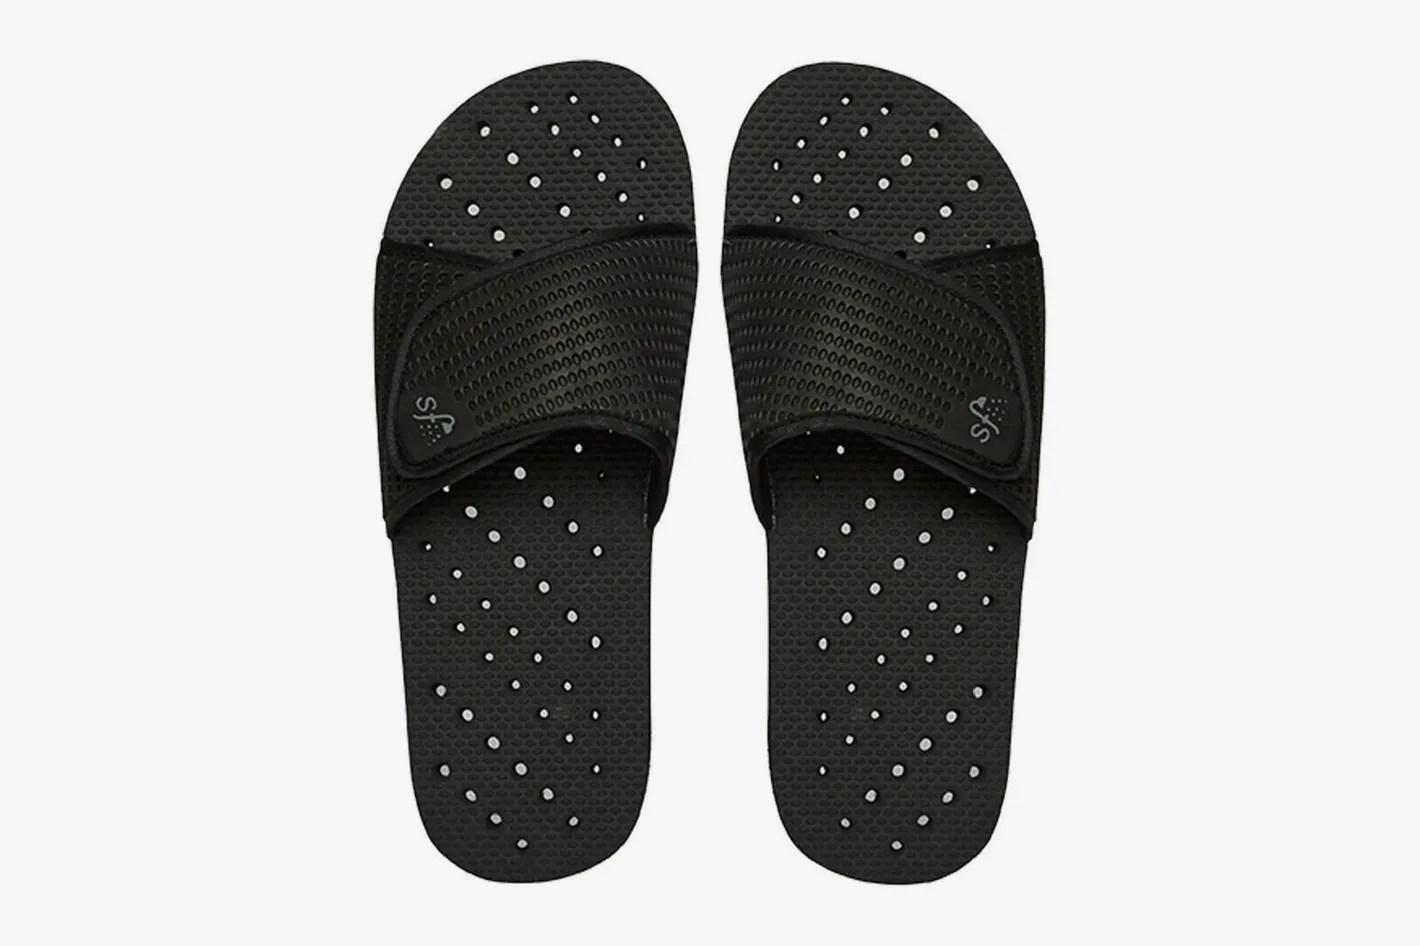 Best Sandals Hoy Salt Water Sandals Review